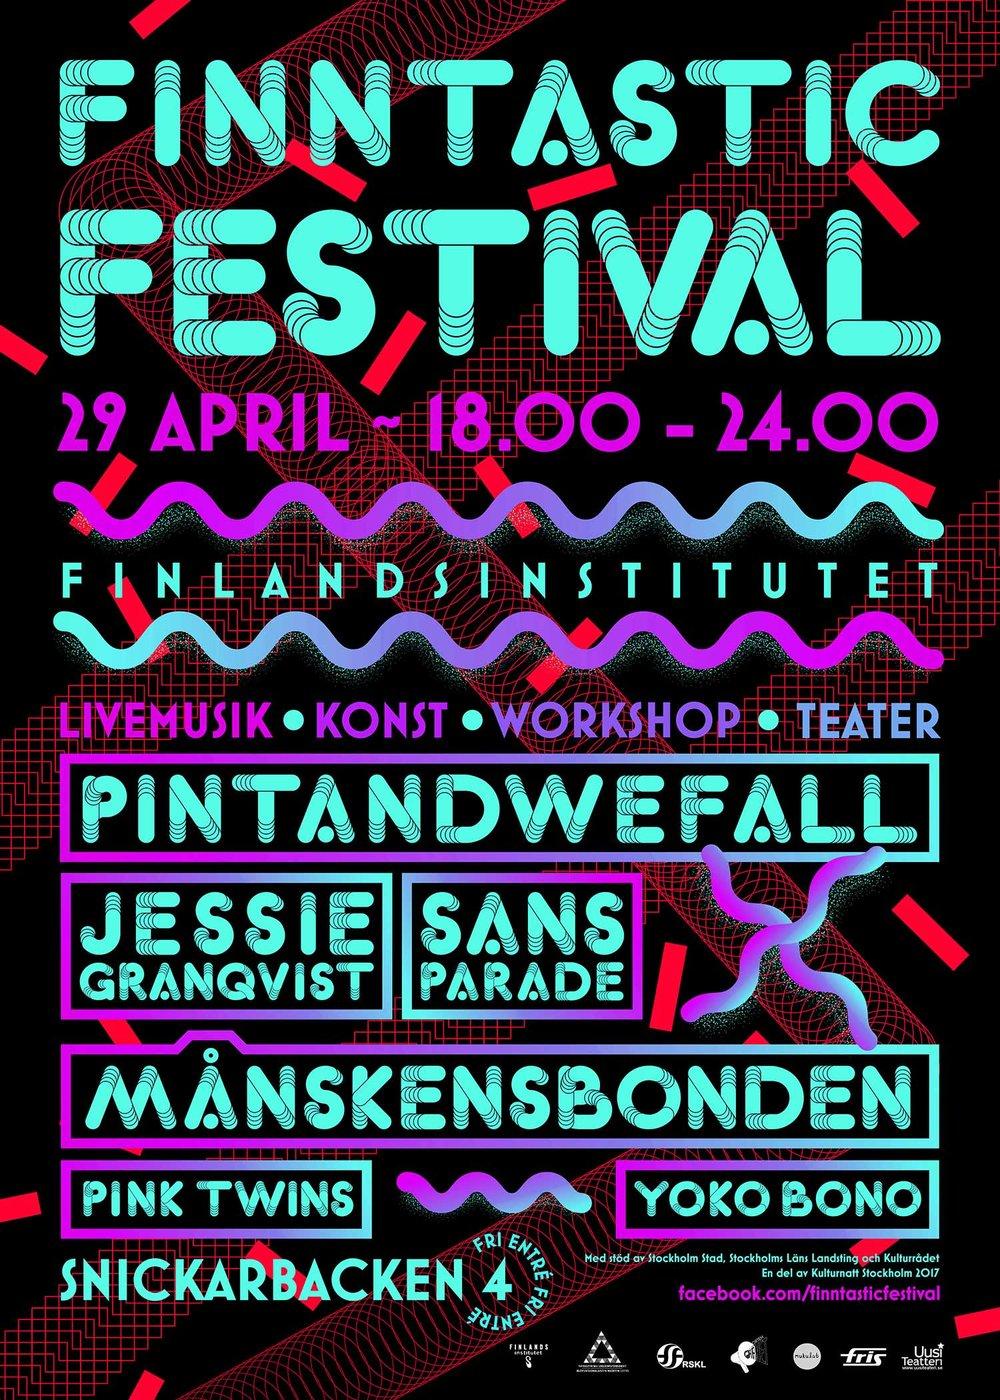 Finntastic Festival